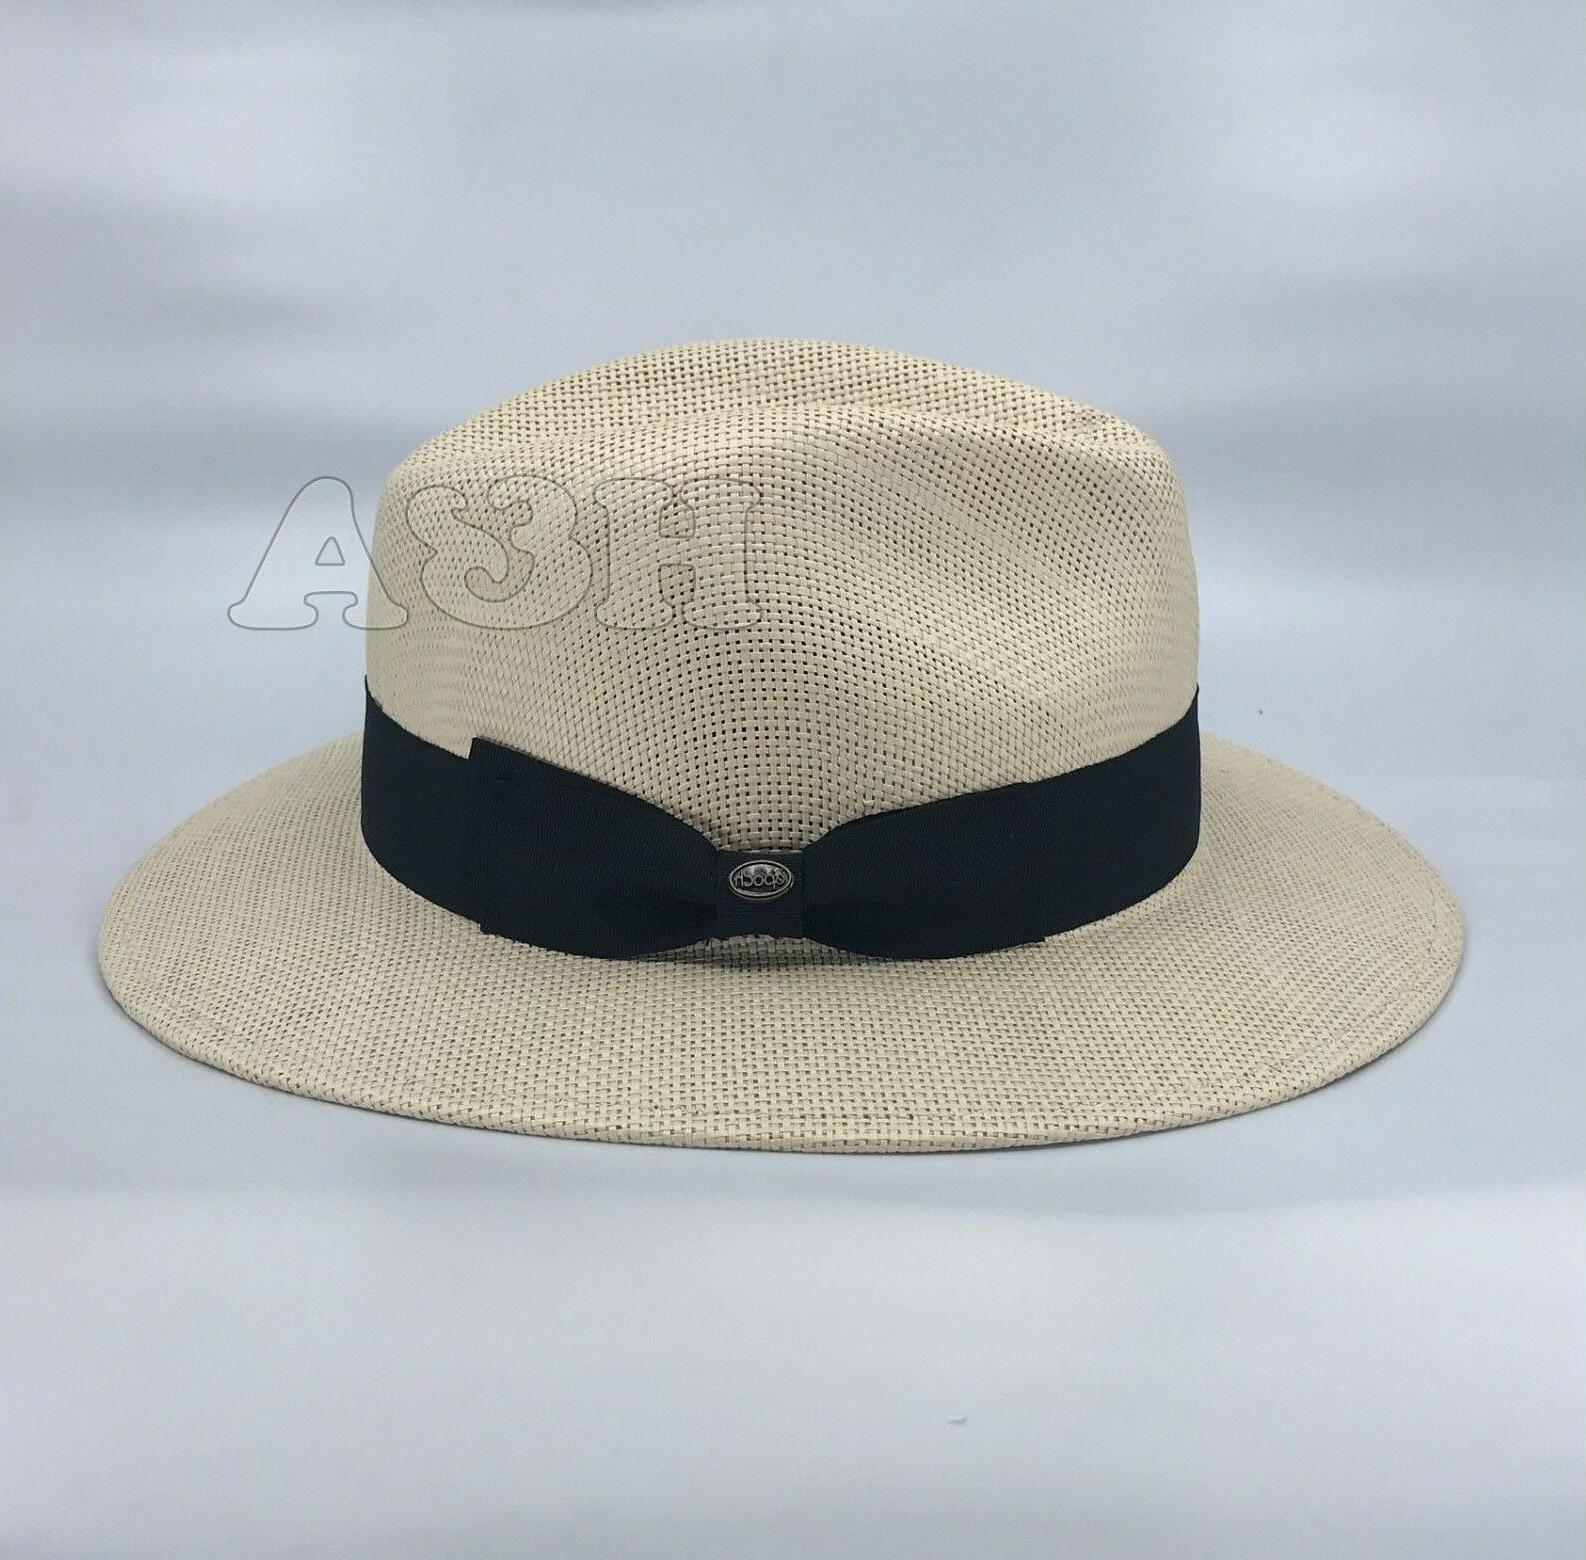 Epoch Classic Mens Straw Panama Hat, Hat